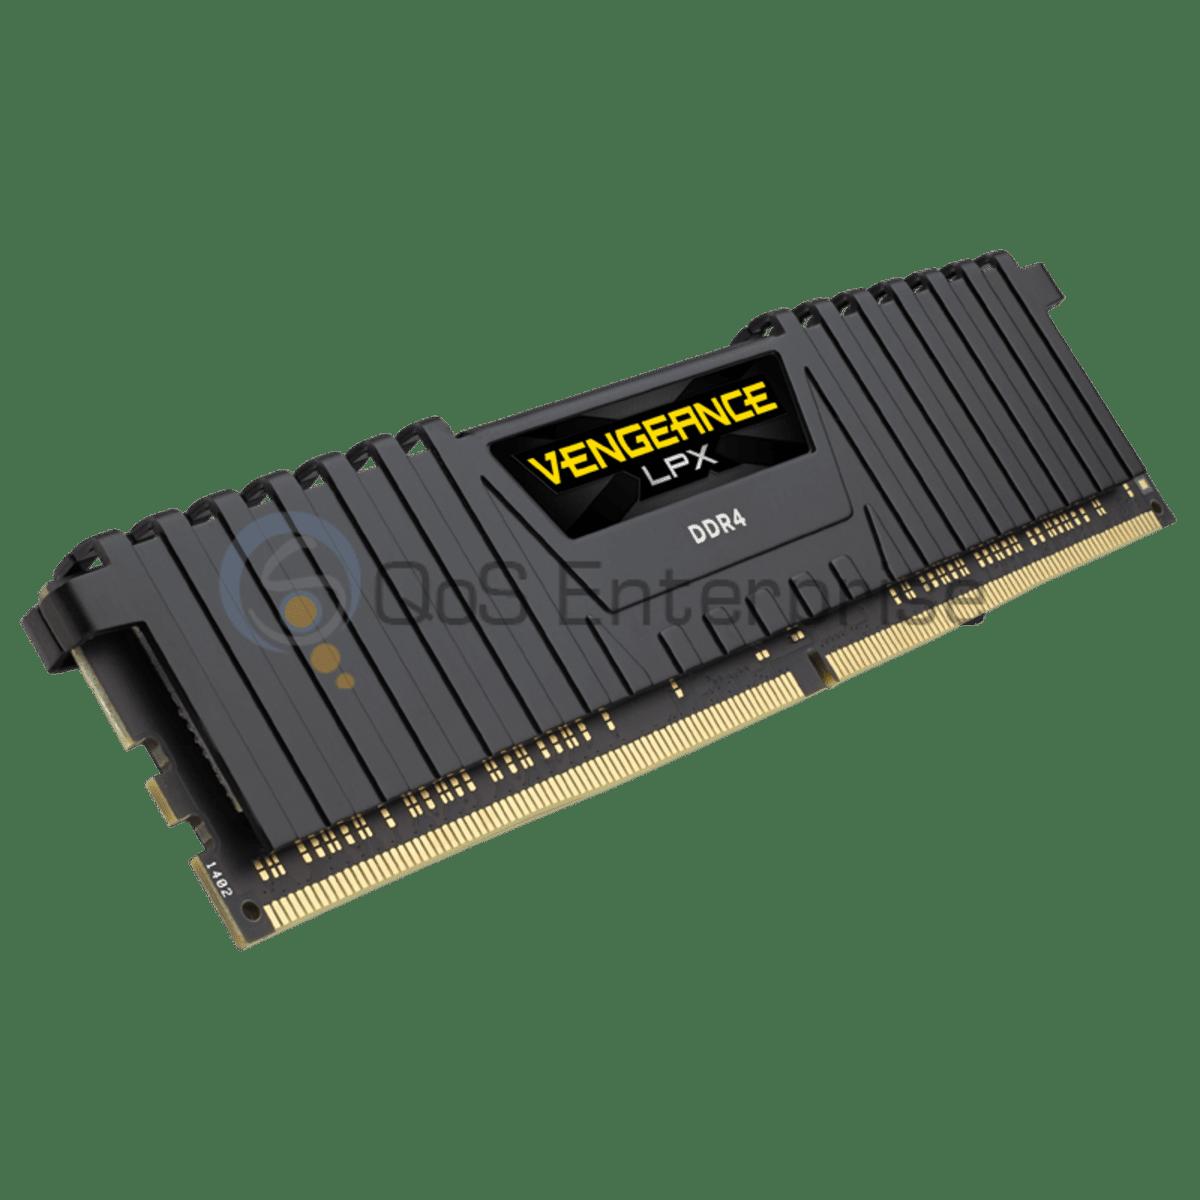 Corsair Vengeance LPX 8GB DDR4 DRAM 2400MHz Ram